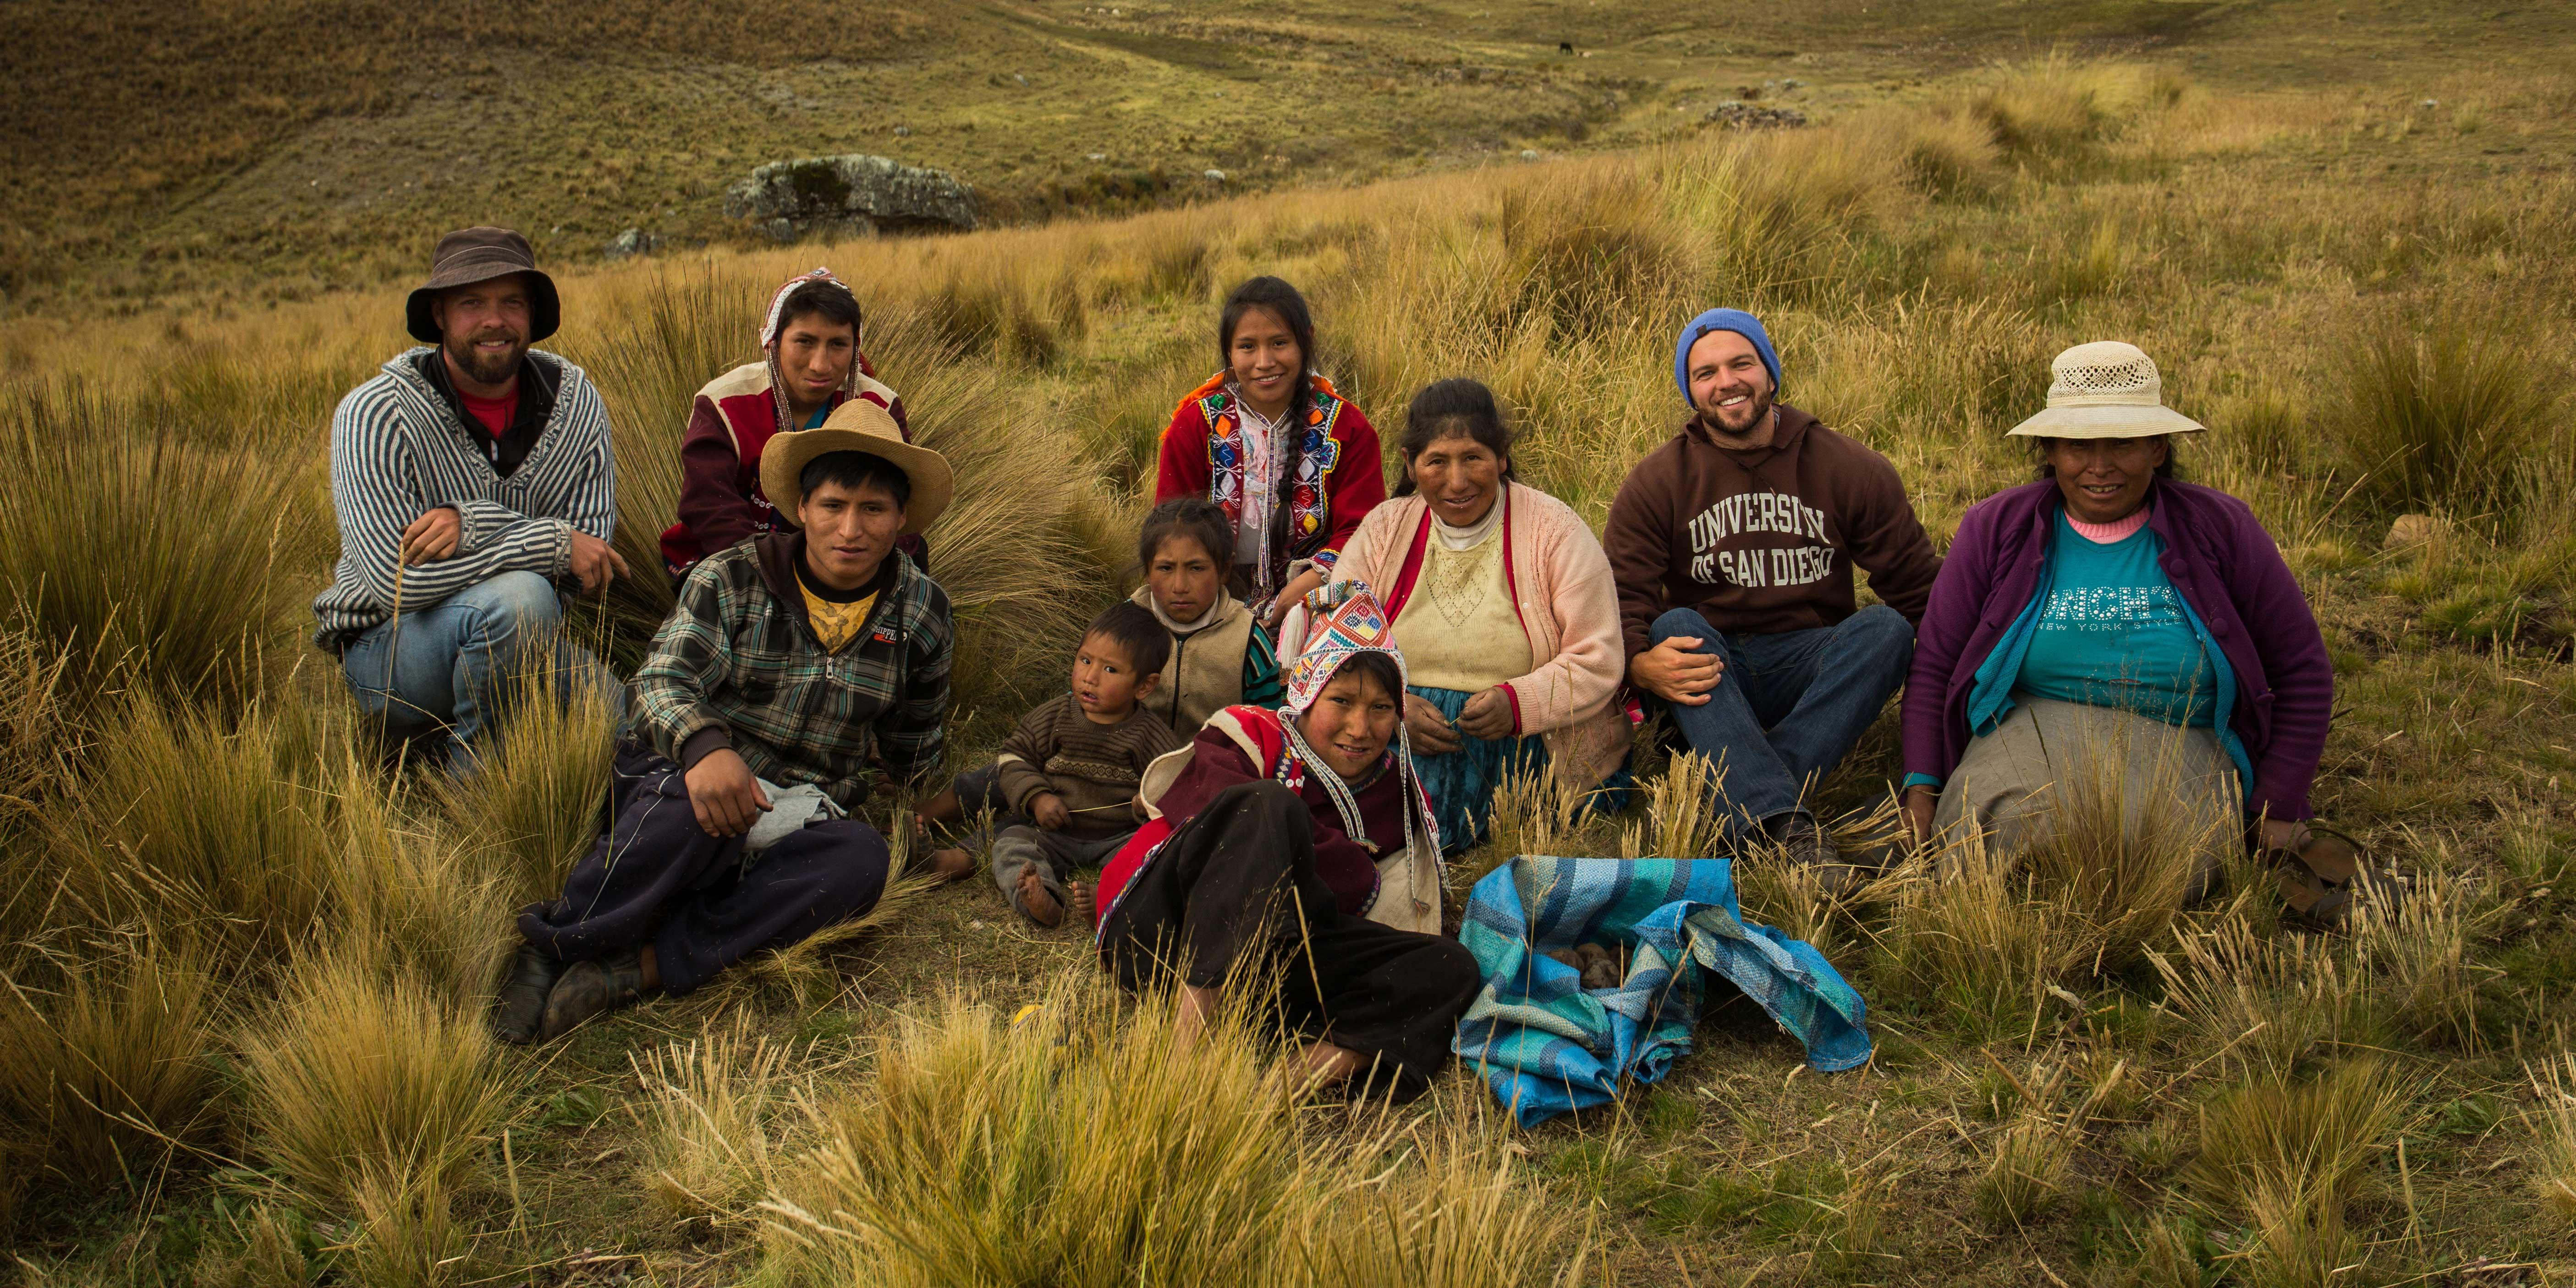 Peruvian farmers and USD alumnus Eric Ebner